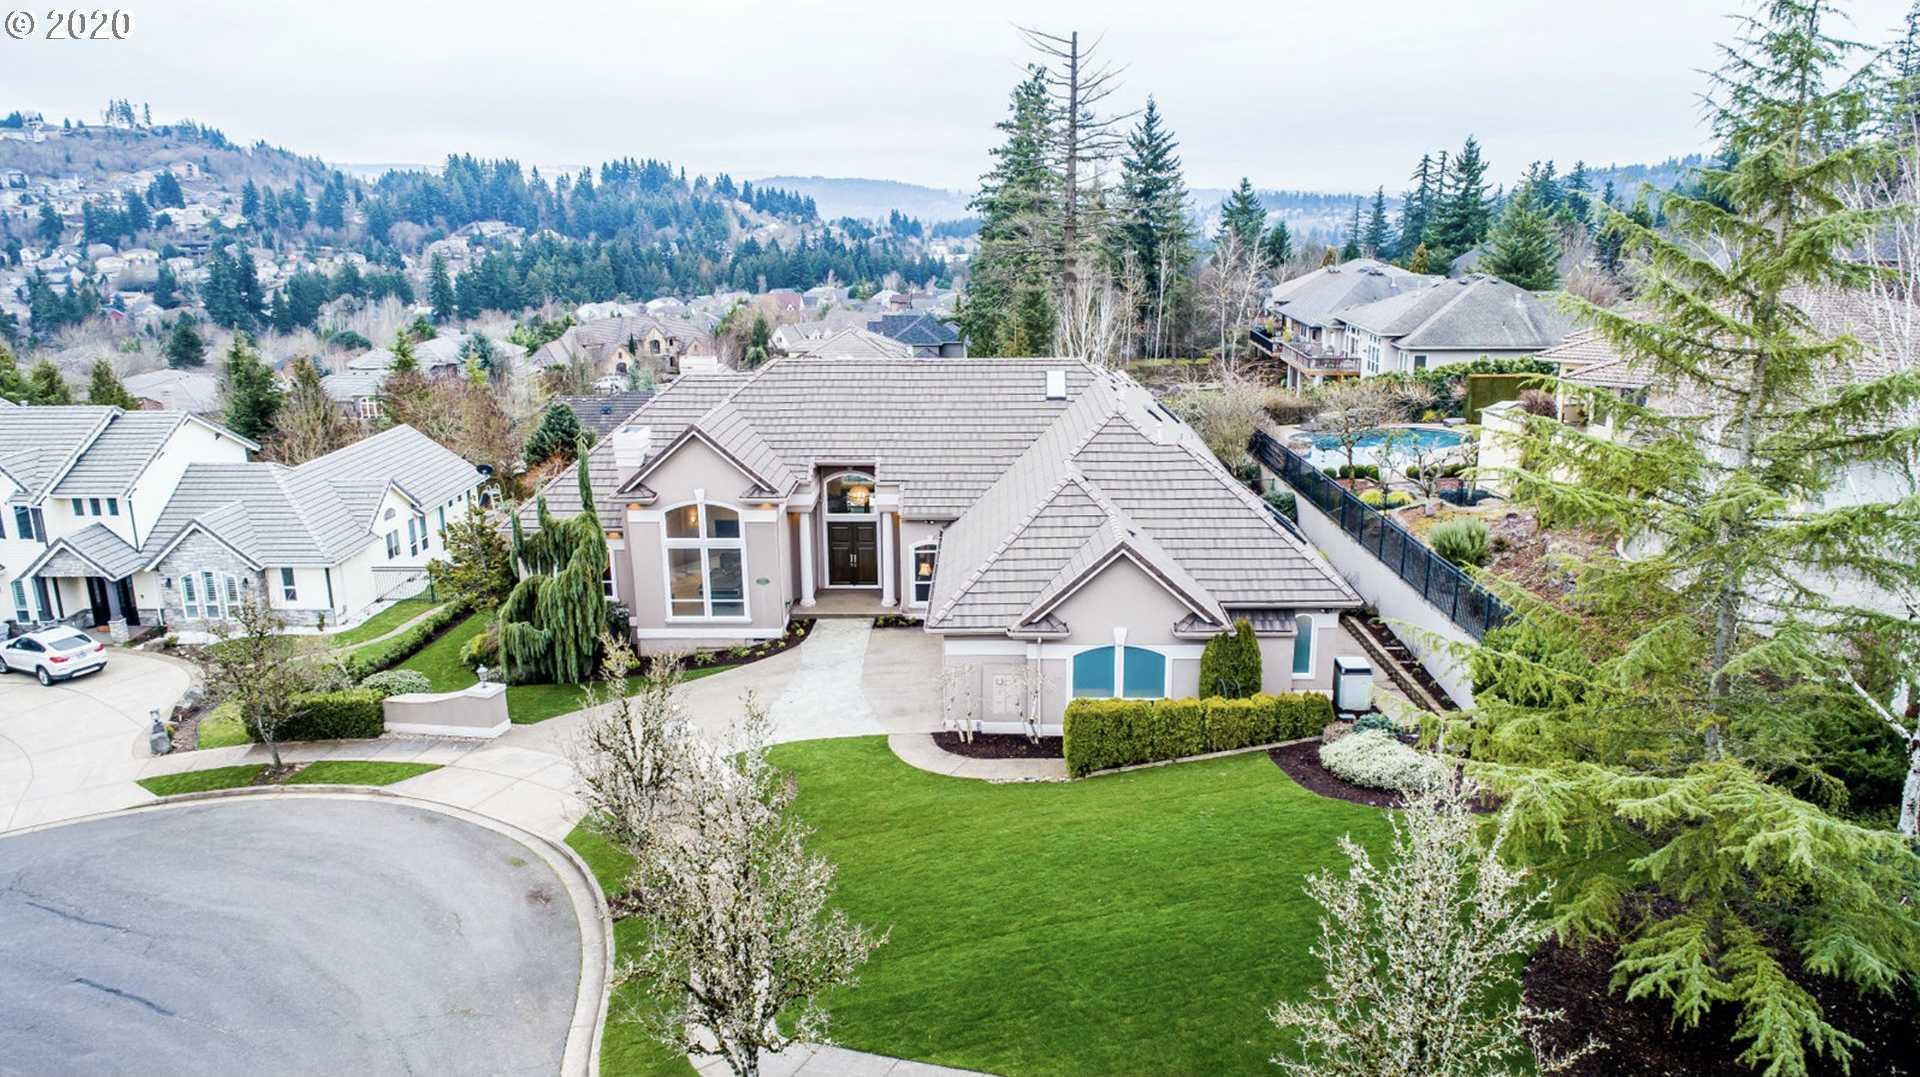 $949,950 - 4Br/4Ba -  for Sale in Happy Valley, Happy Valley